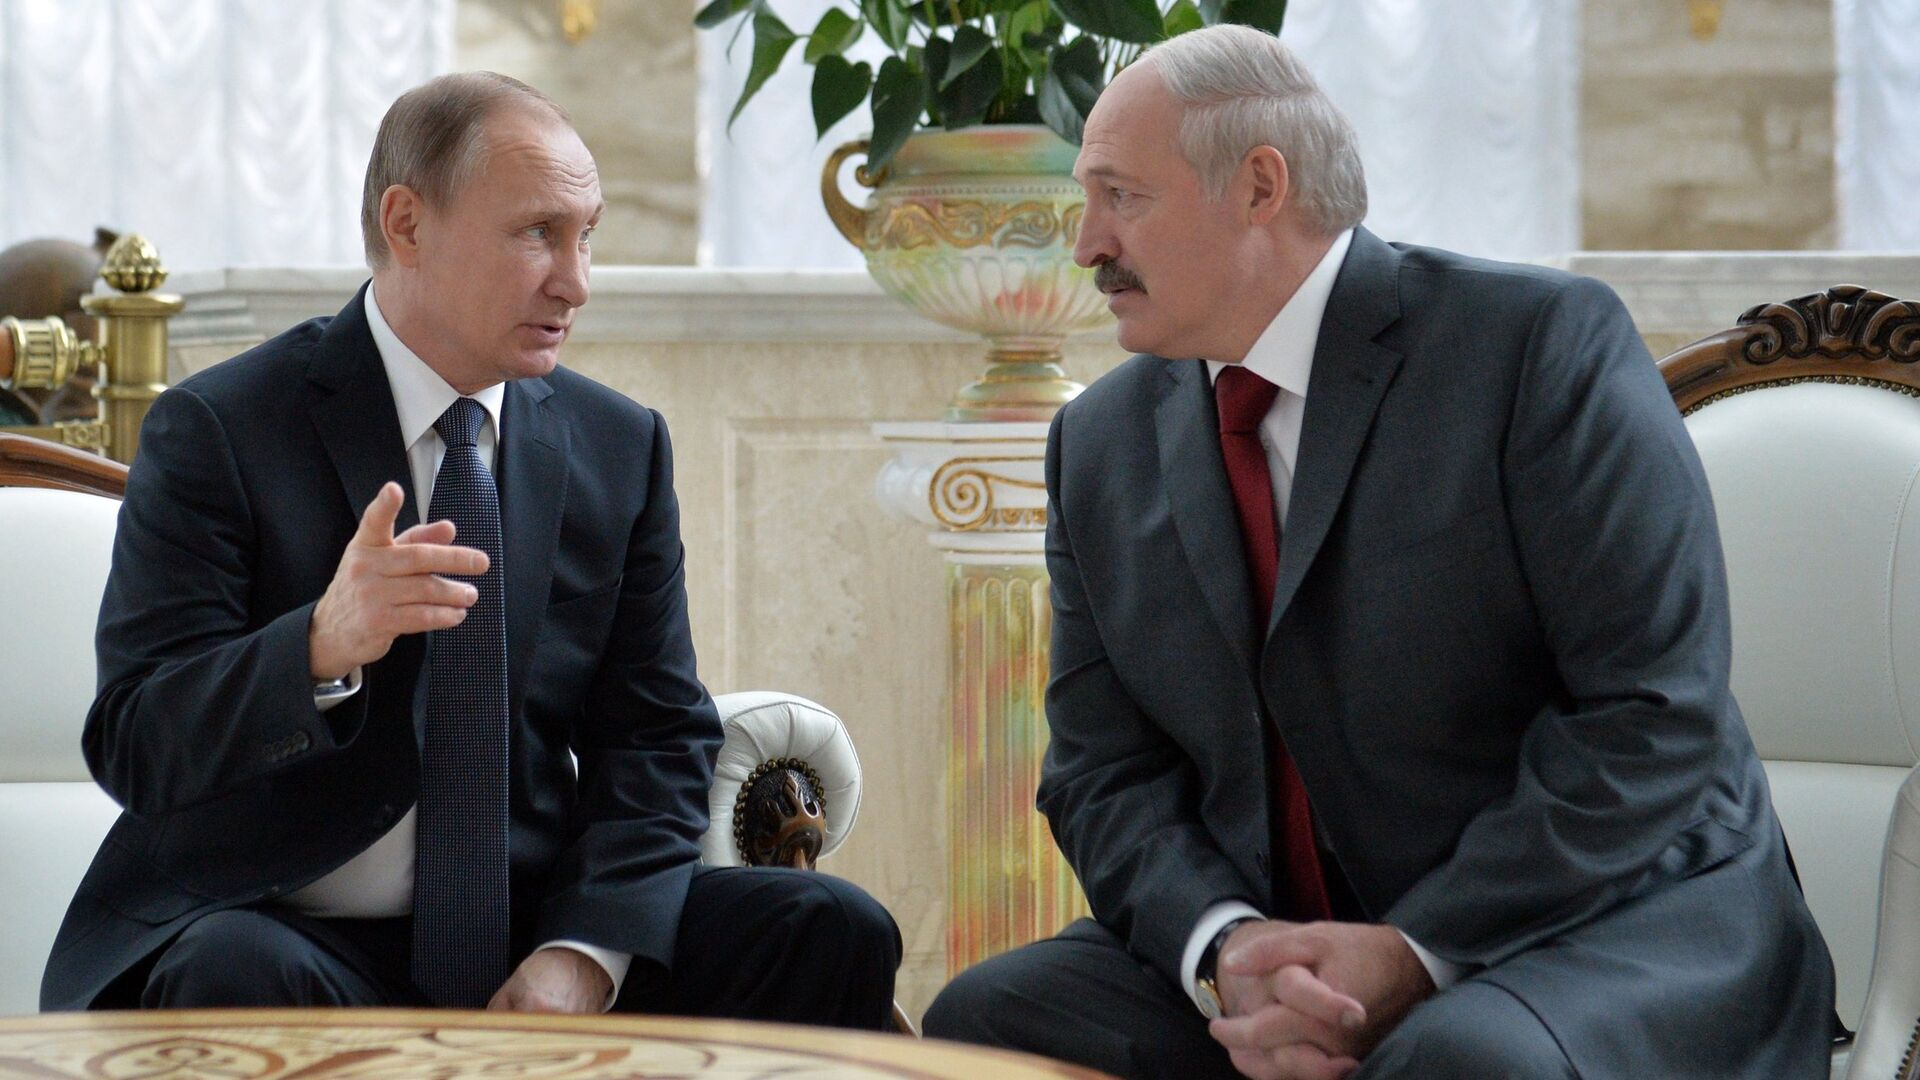 Владимир Путин и Александр Лукашенко на заседании ВГС - Sputnik Узбекистан, 1920, 11.09.2021